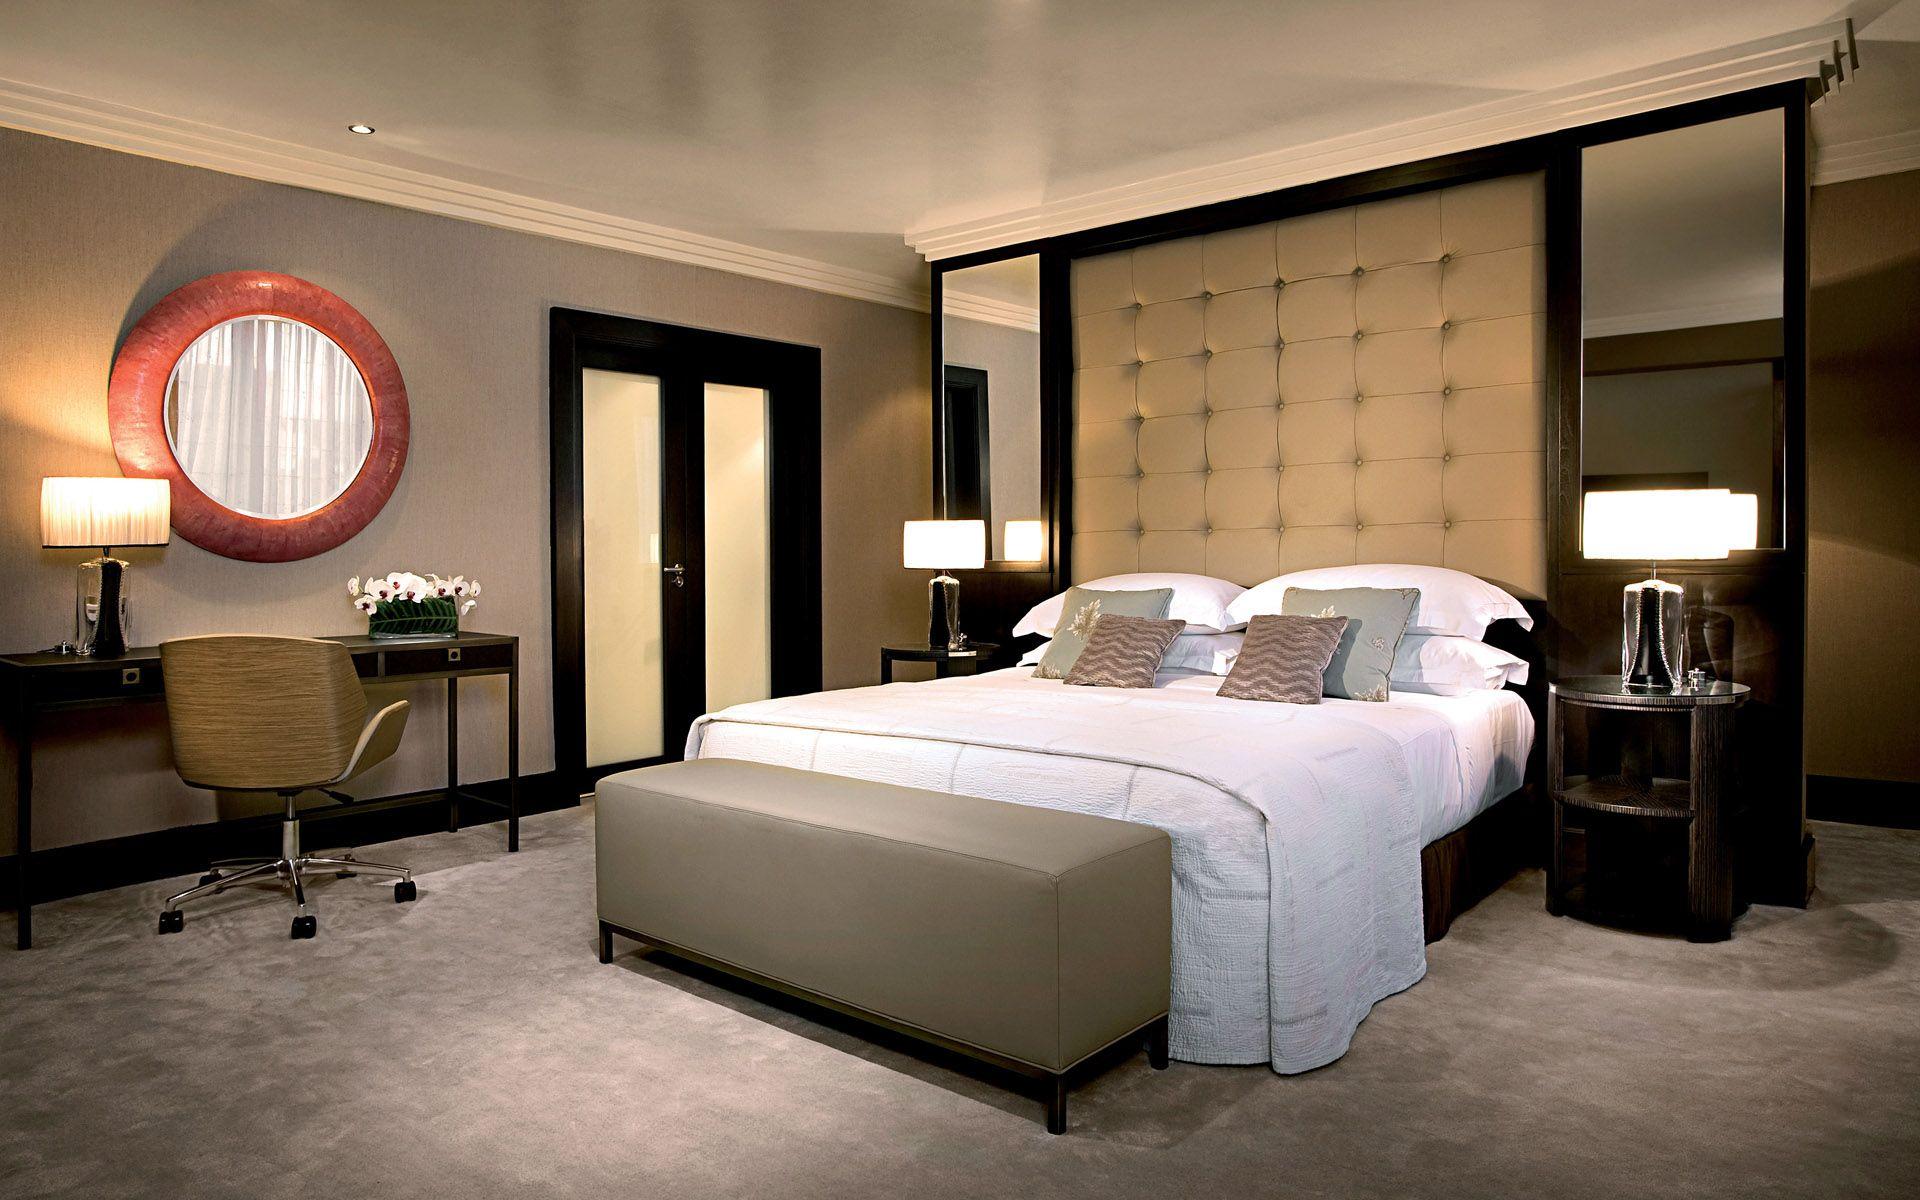 bedroom interior design considerations home interior decoration rh pinterest com